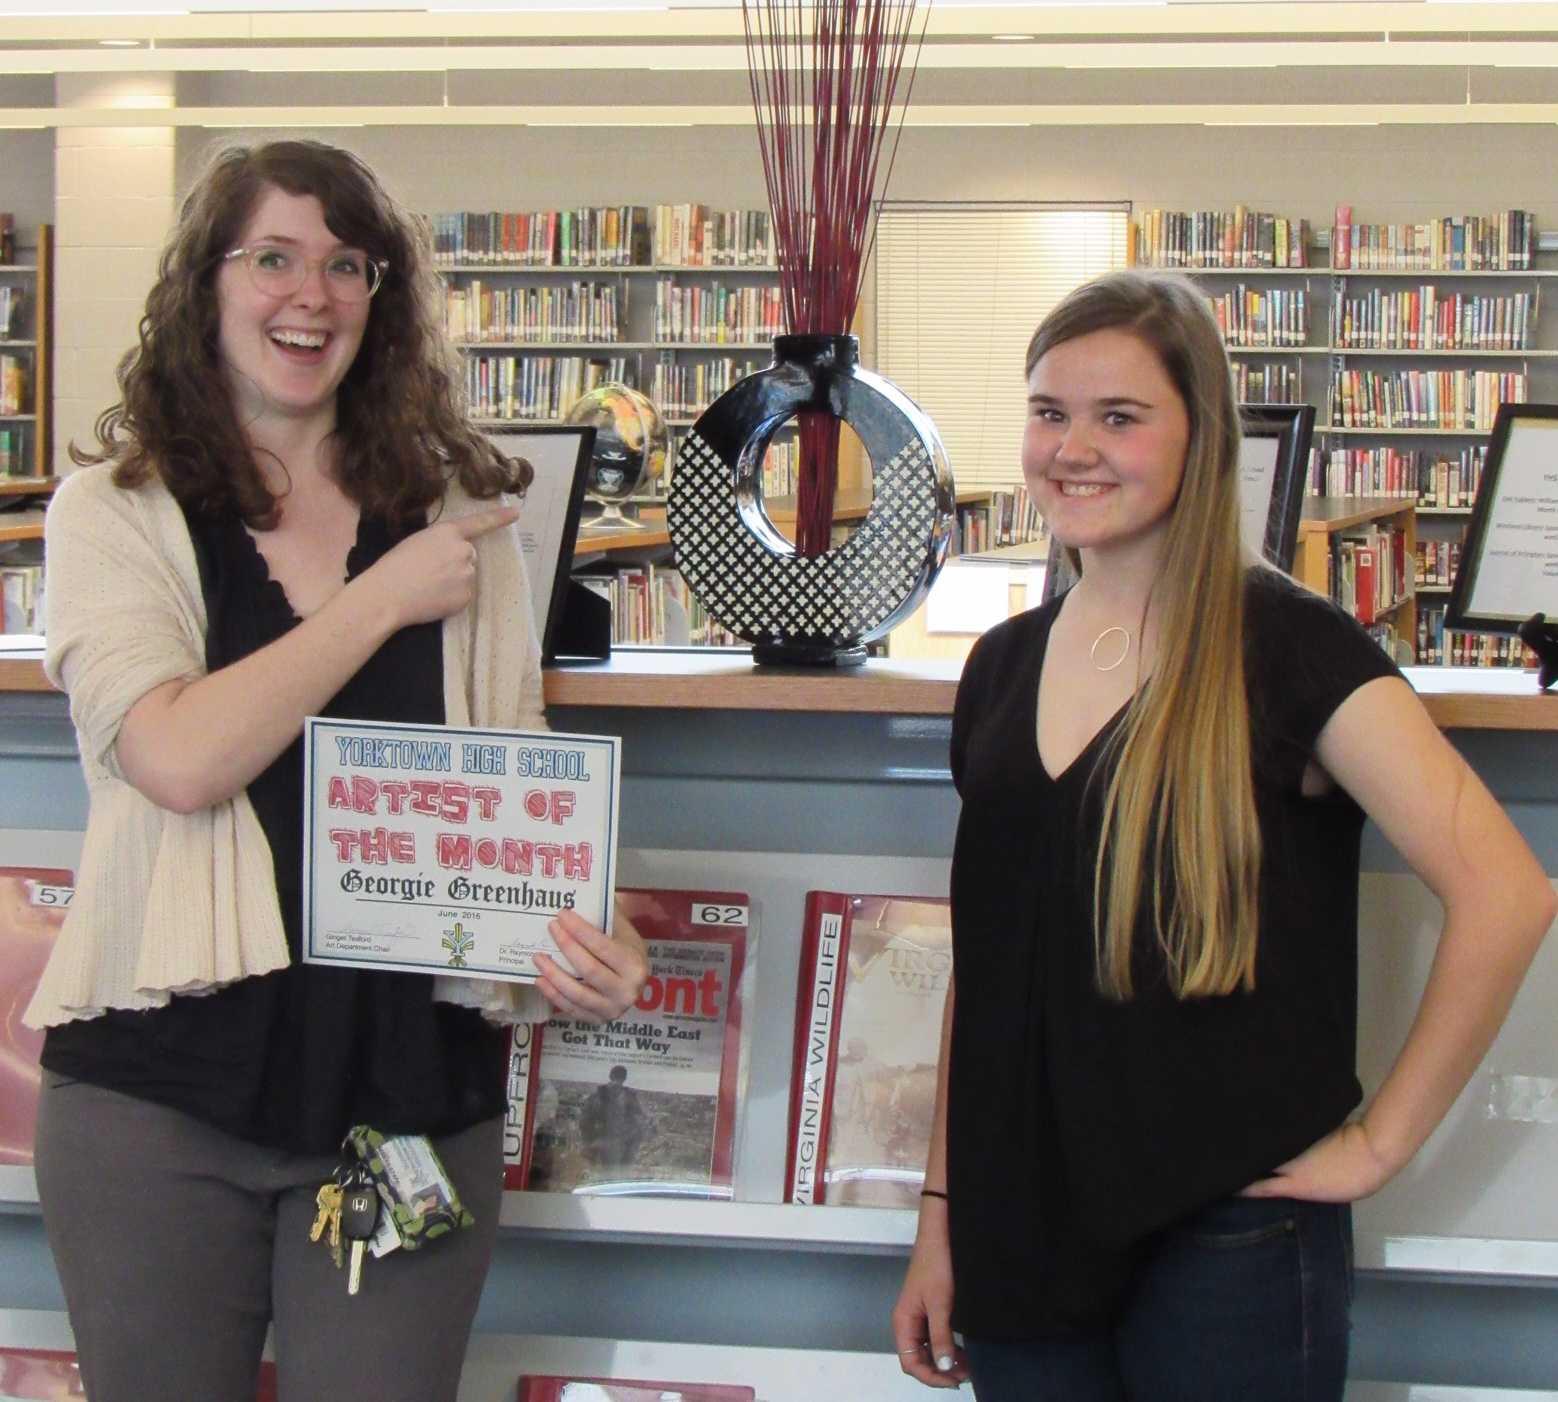 Junior Georgie Greenhaus receiving her Artist of the Month Award